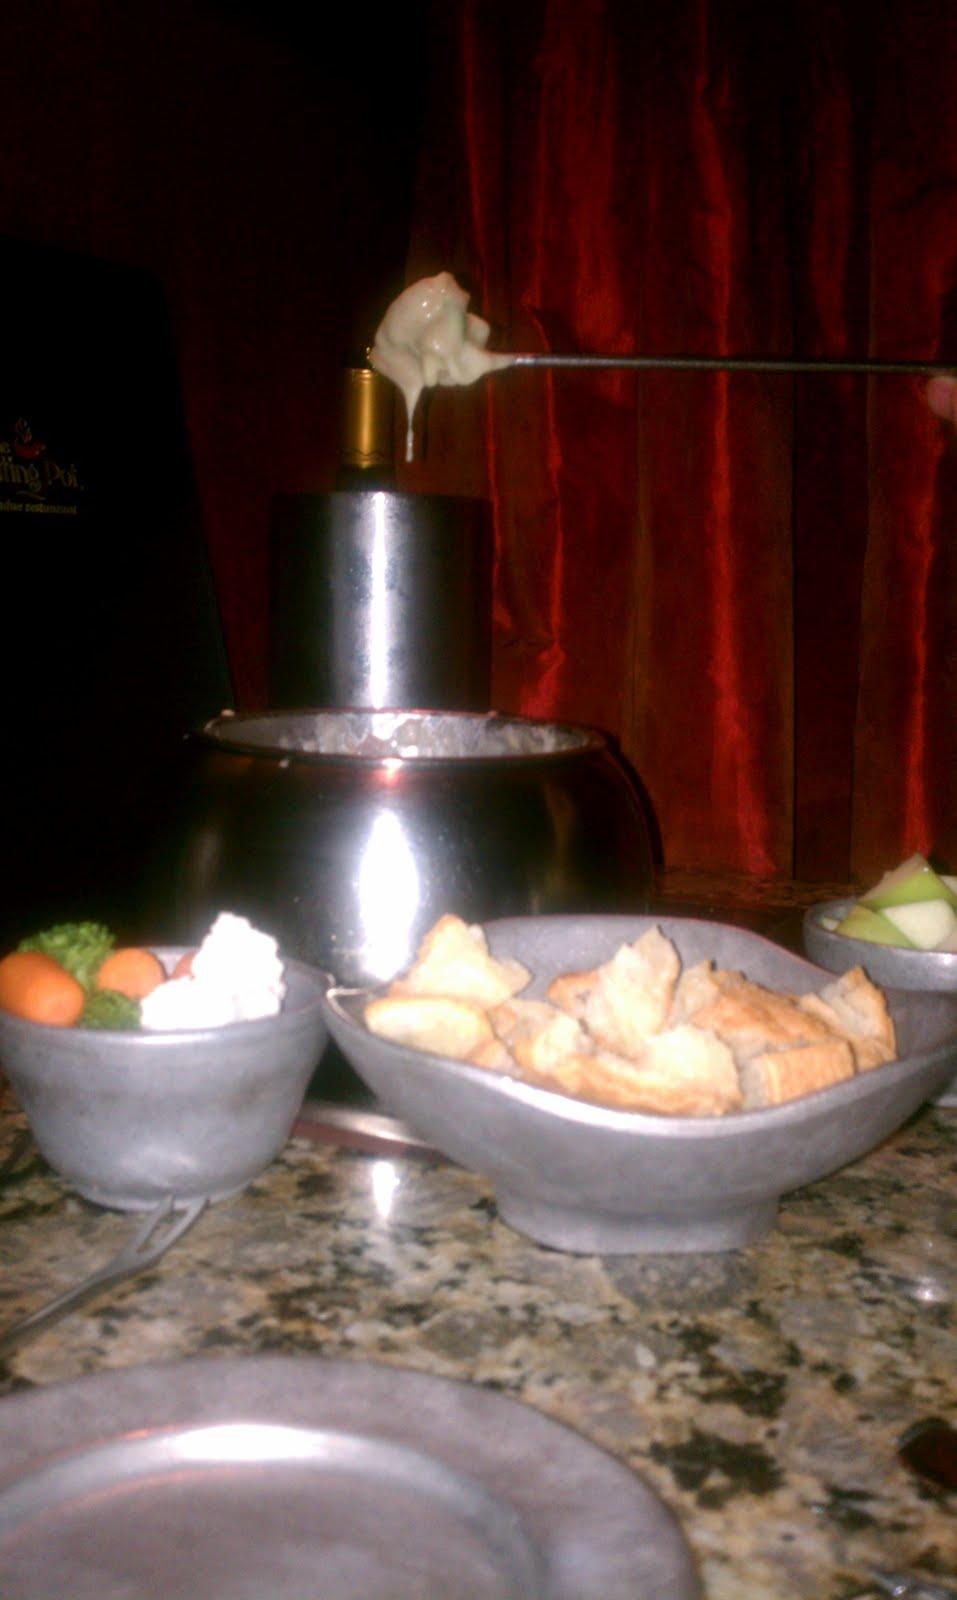 Gluten Free Durham: The Melting Pot, Restaurant Review